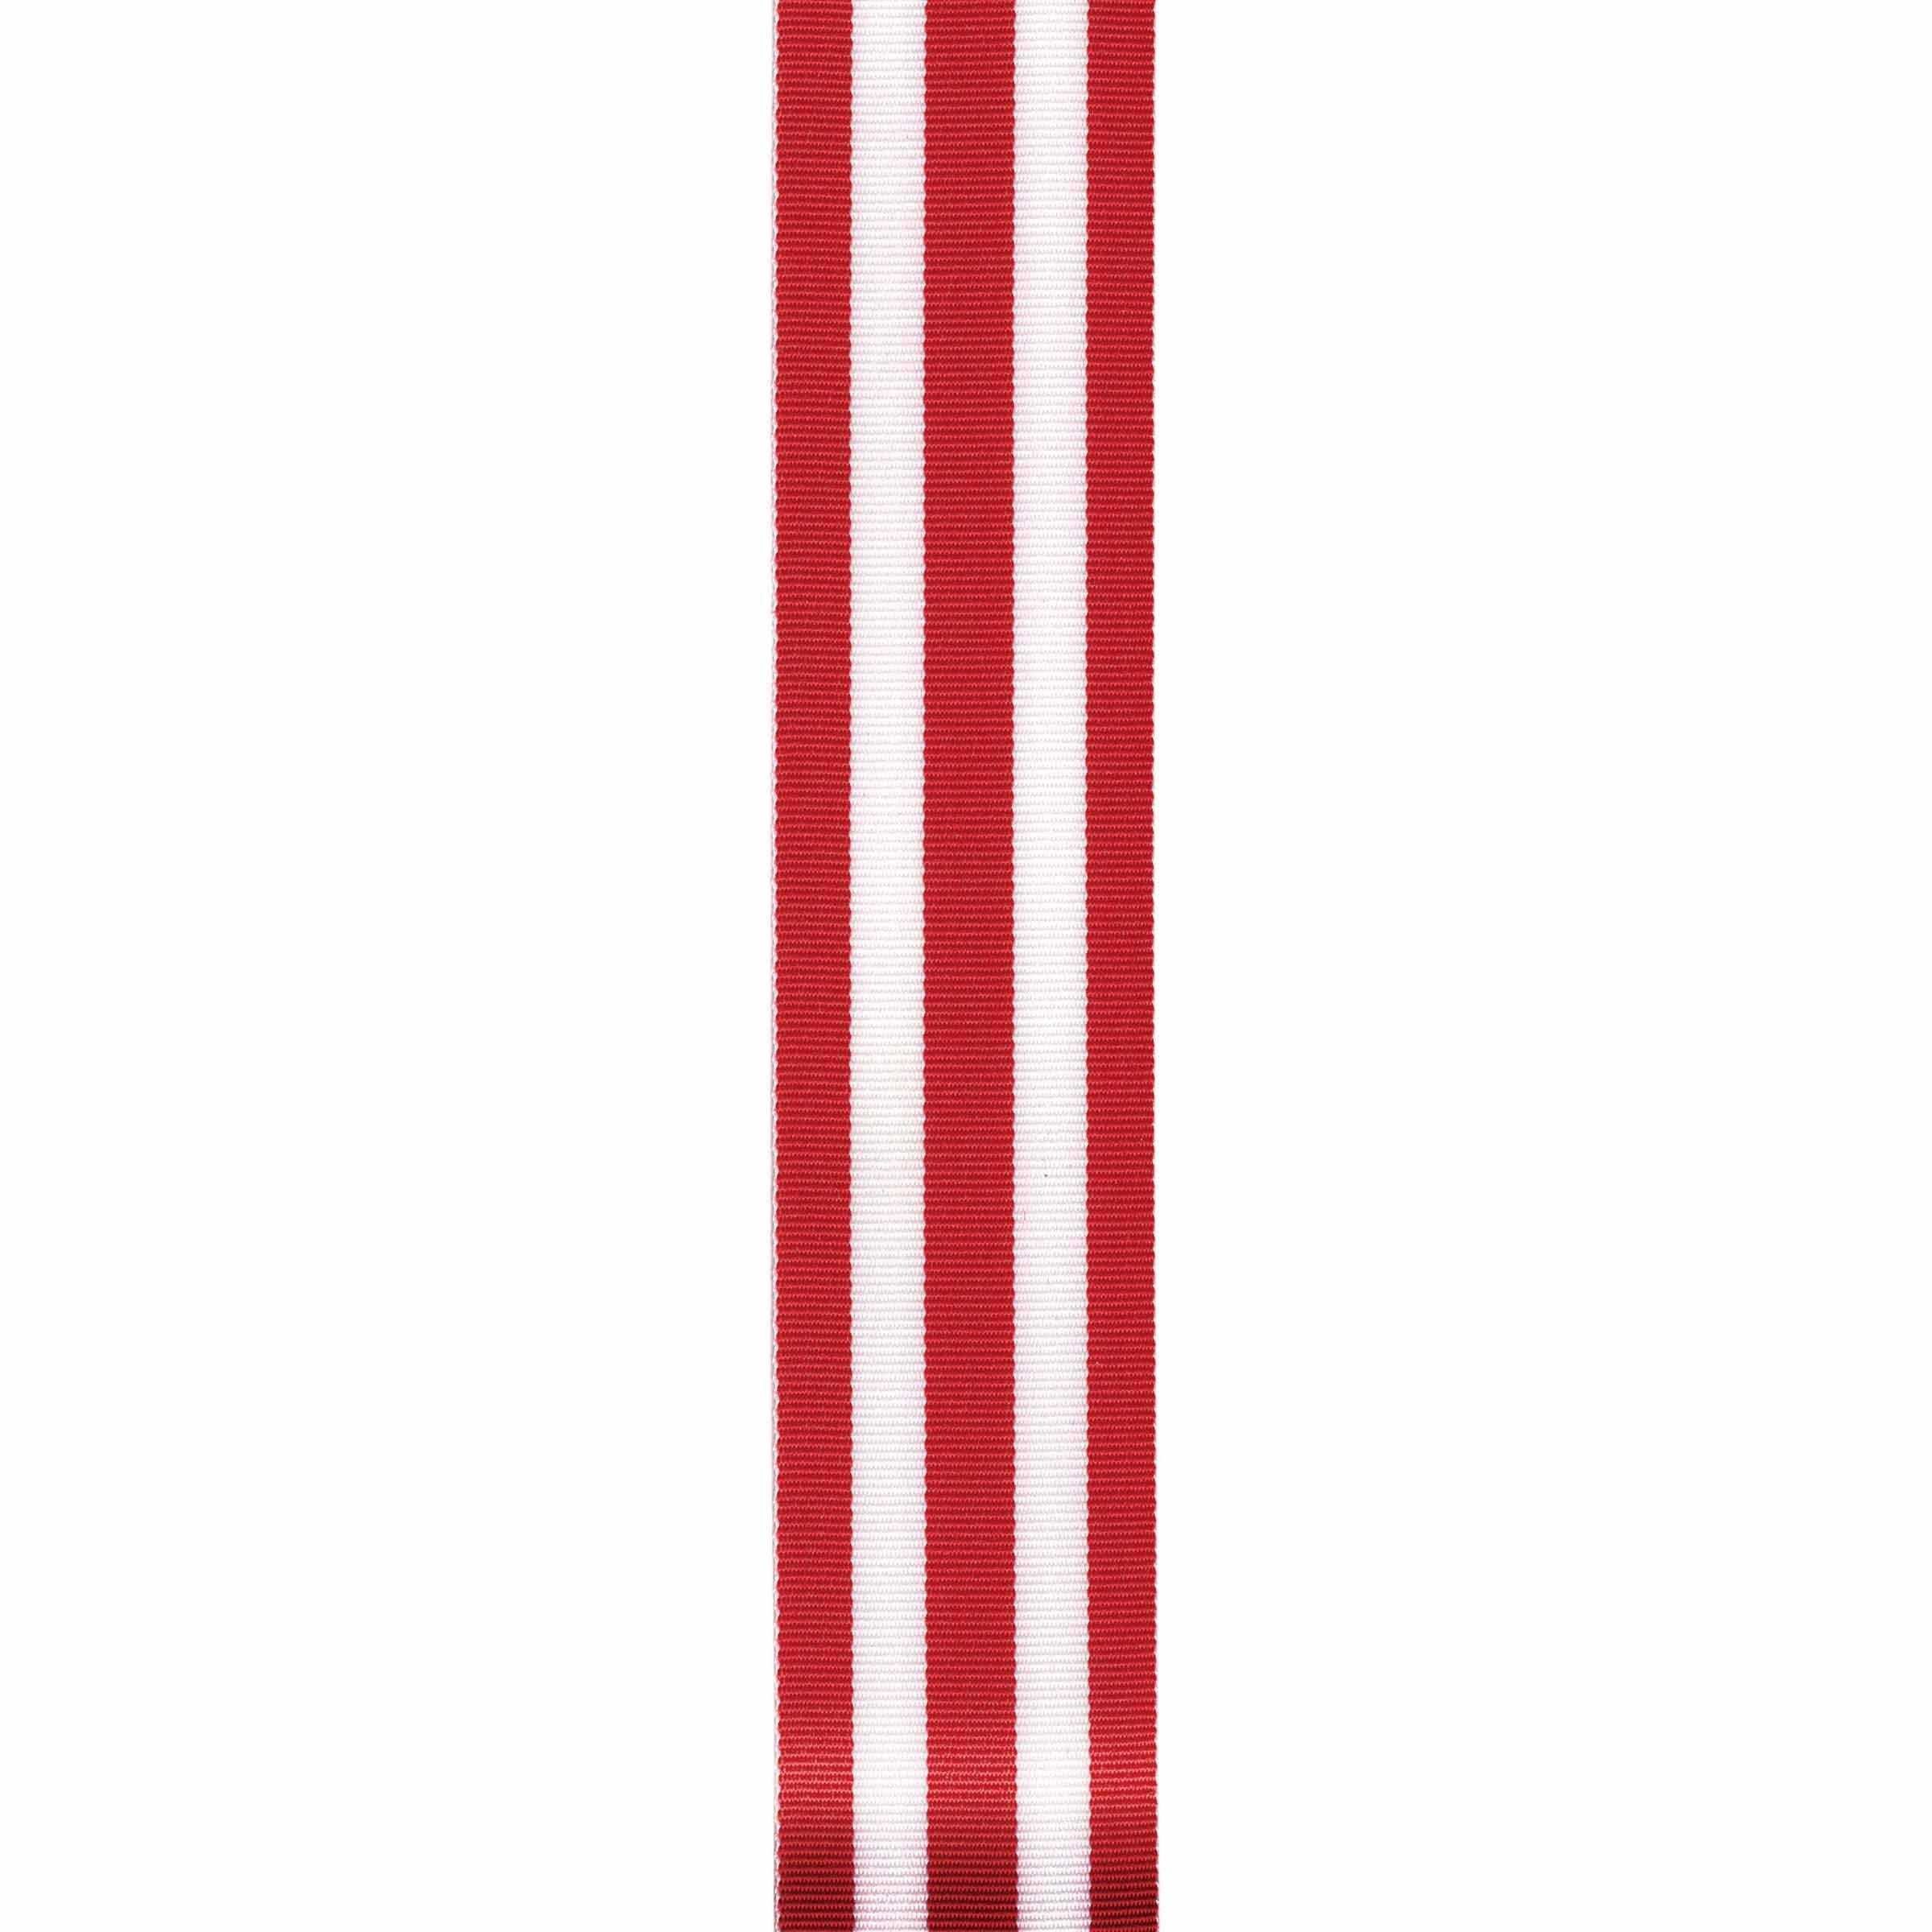 Offray Monostripe Craft Ribbon, 1 1/2-Inch x 9-Feet, Red